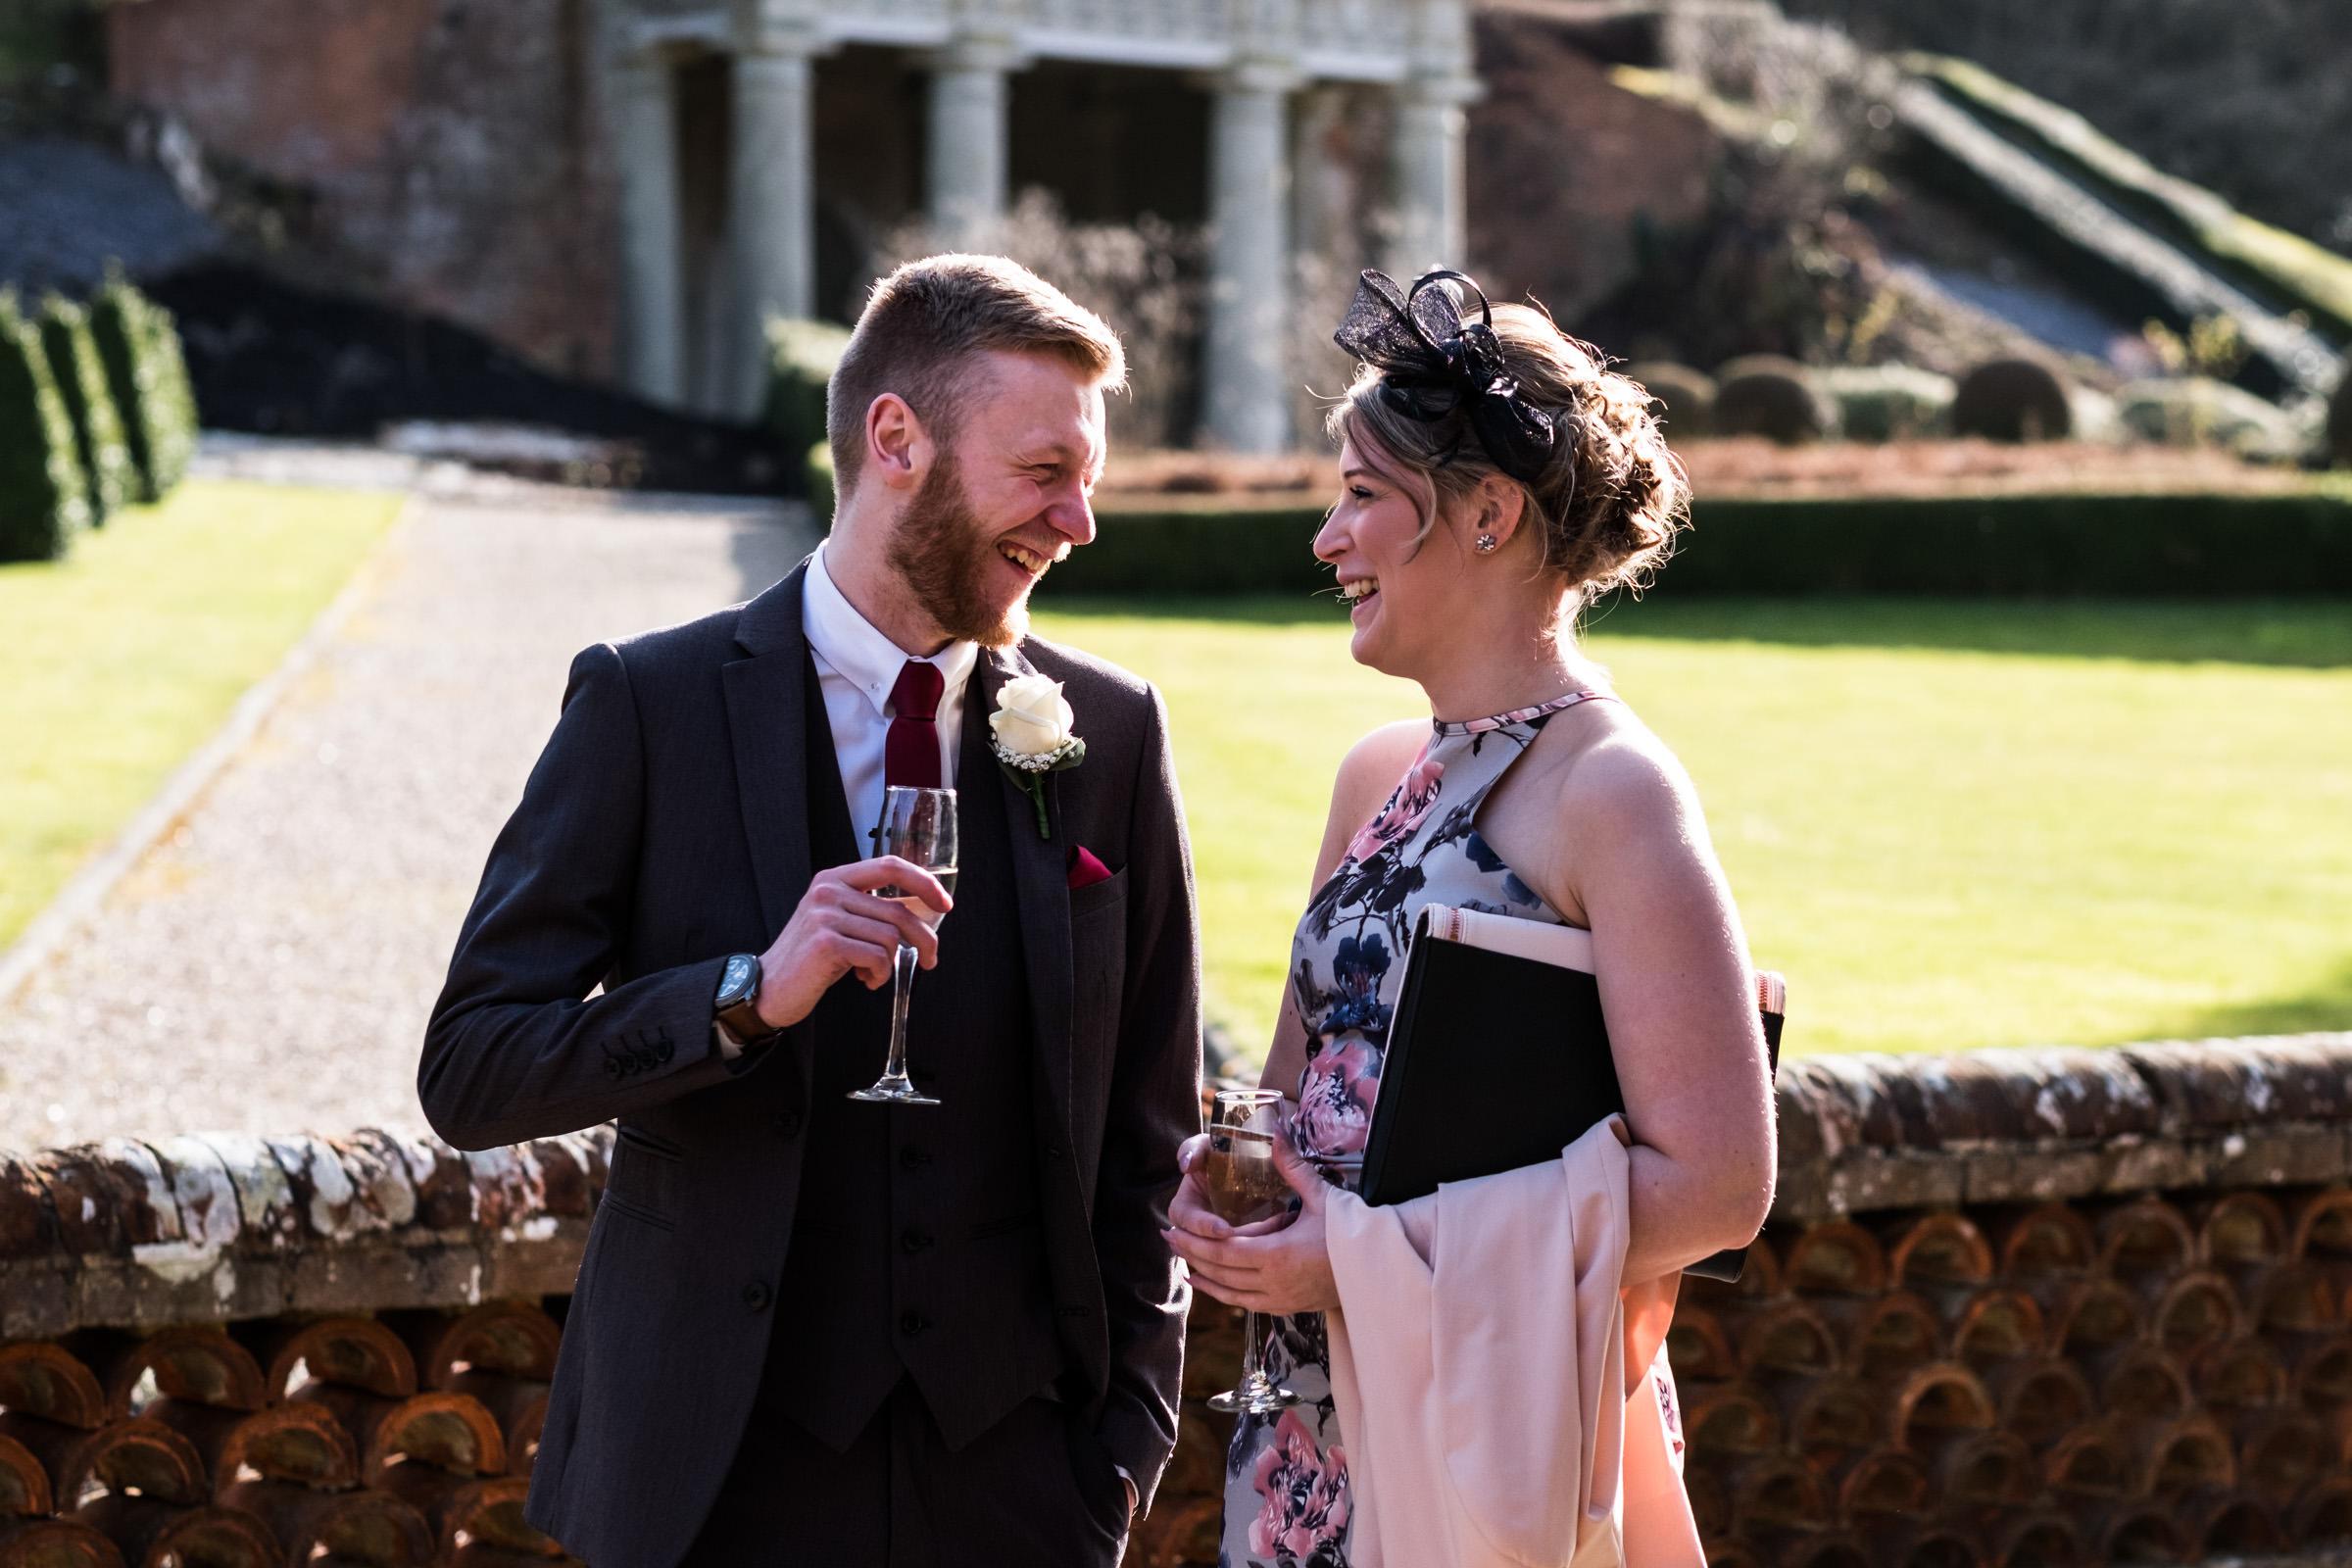 Donna & Nick's Wedding at Wotton House in Dorking 015.jpg